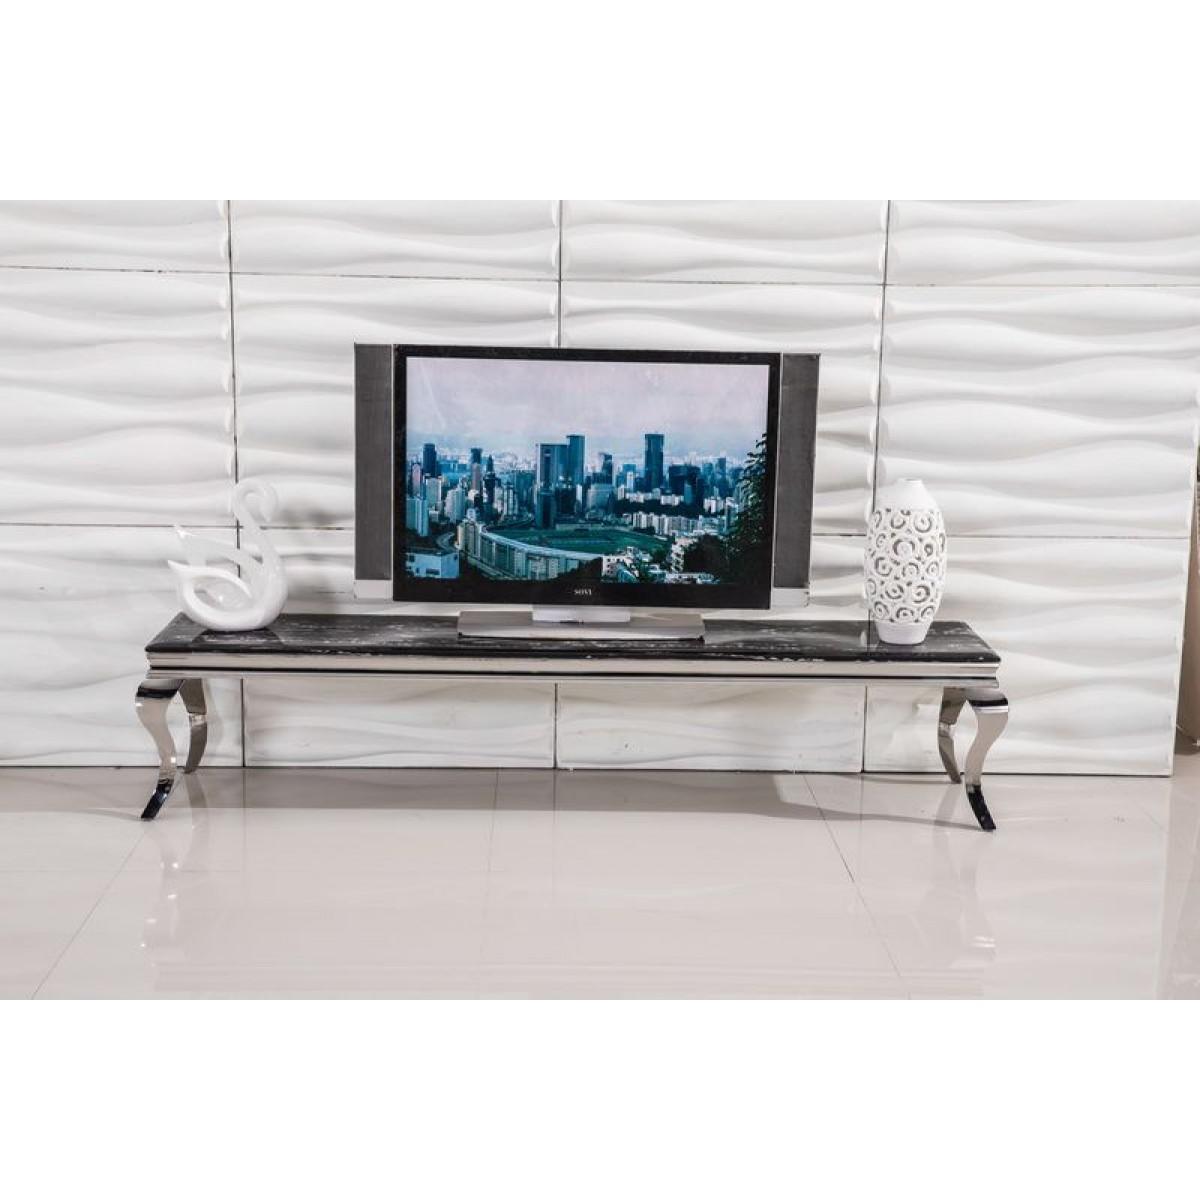 meuble tv duchesse en inox meuble tv